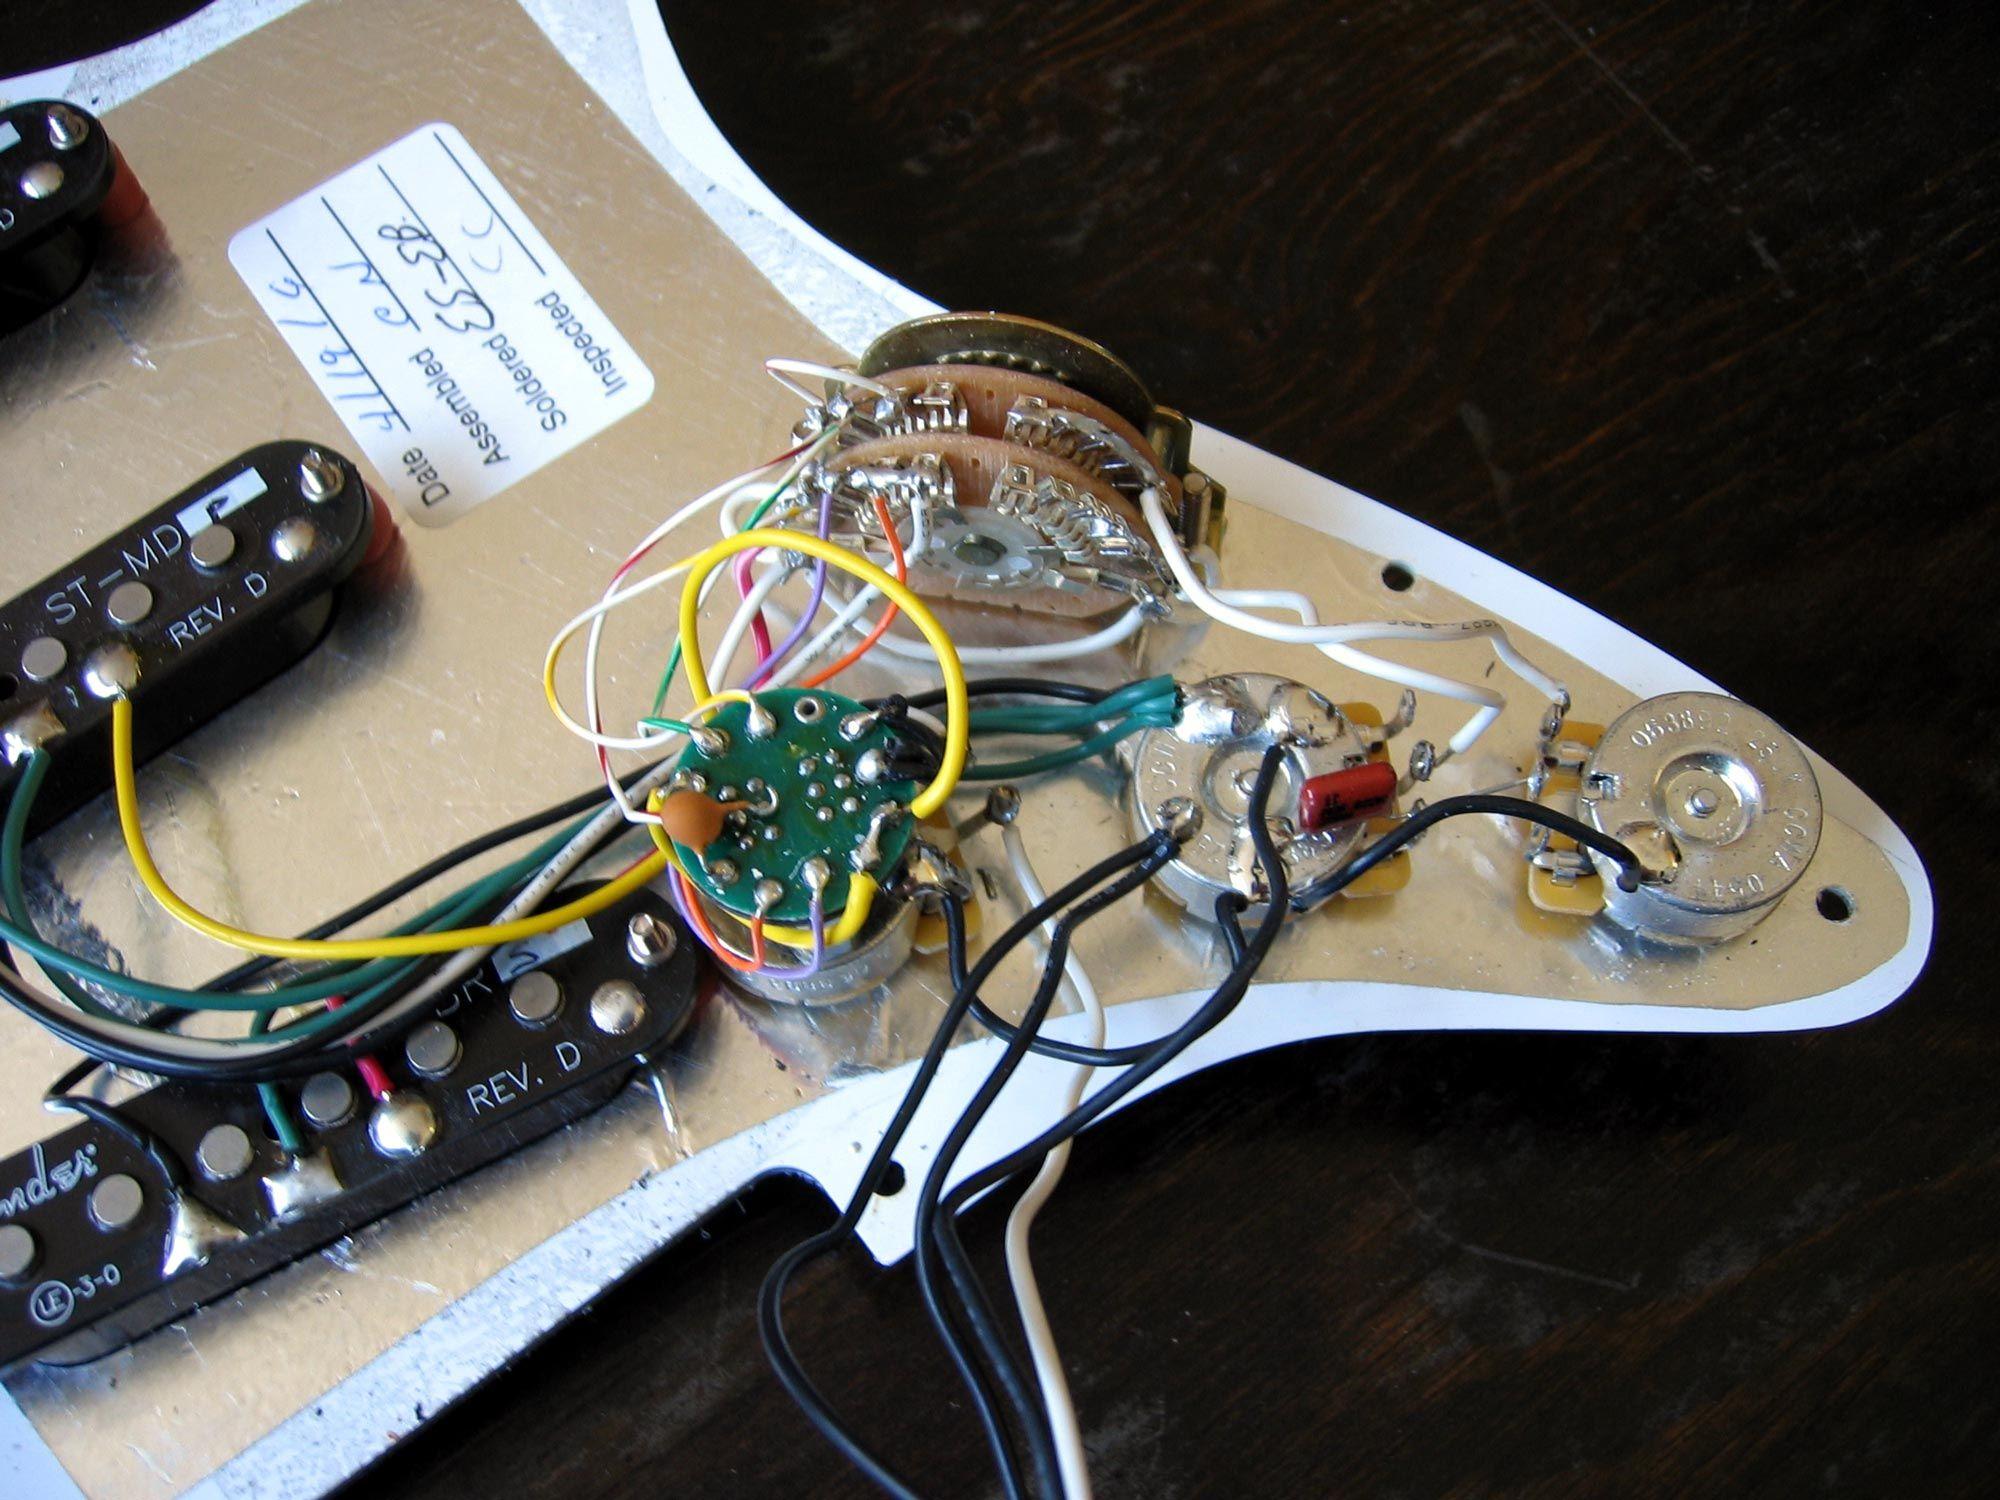 Strat Wiring Diagram Import Switch 1984 Yamaha Virago Fender Deluxe Stratocaster W S 1